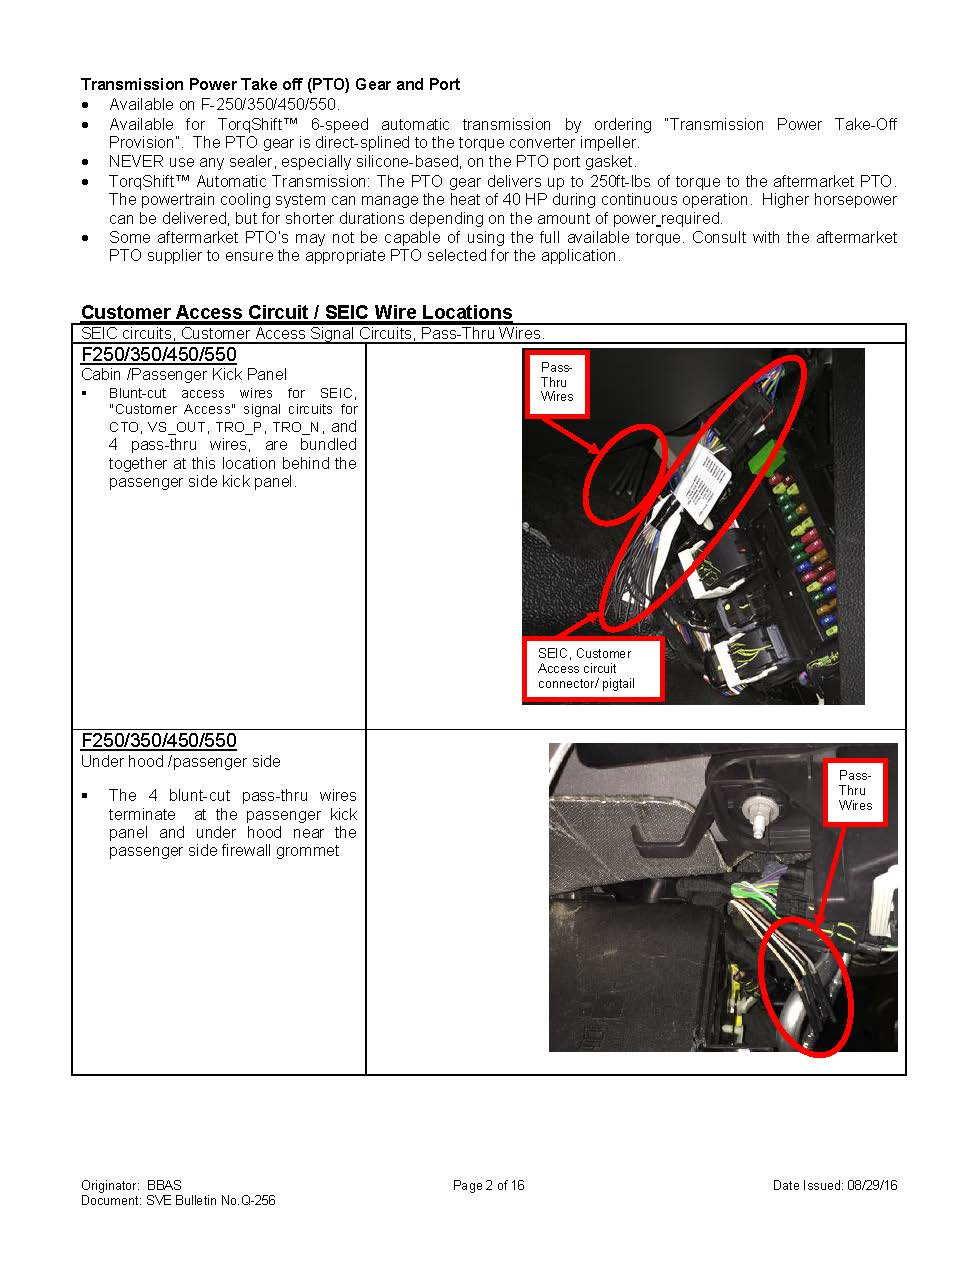 Customer Access Wire Bundle